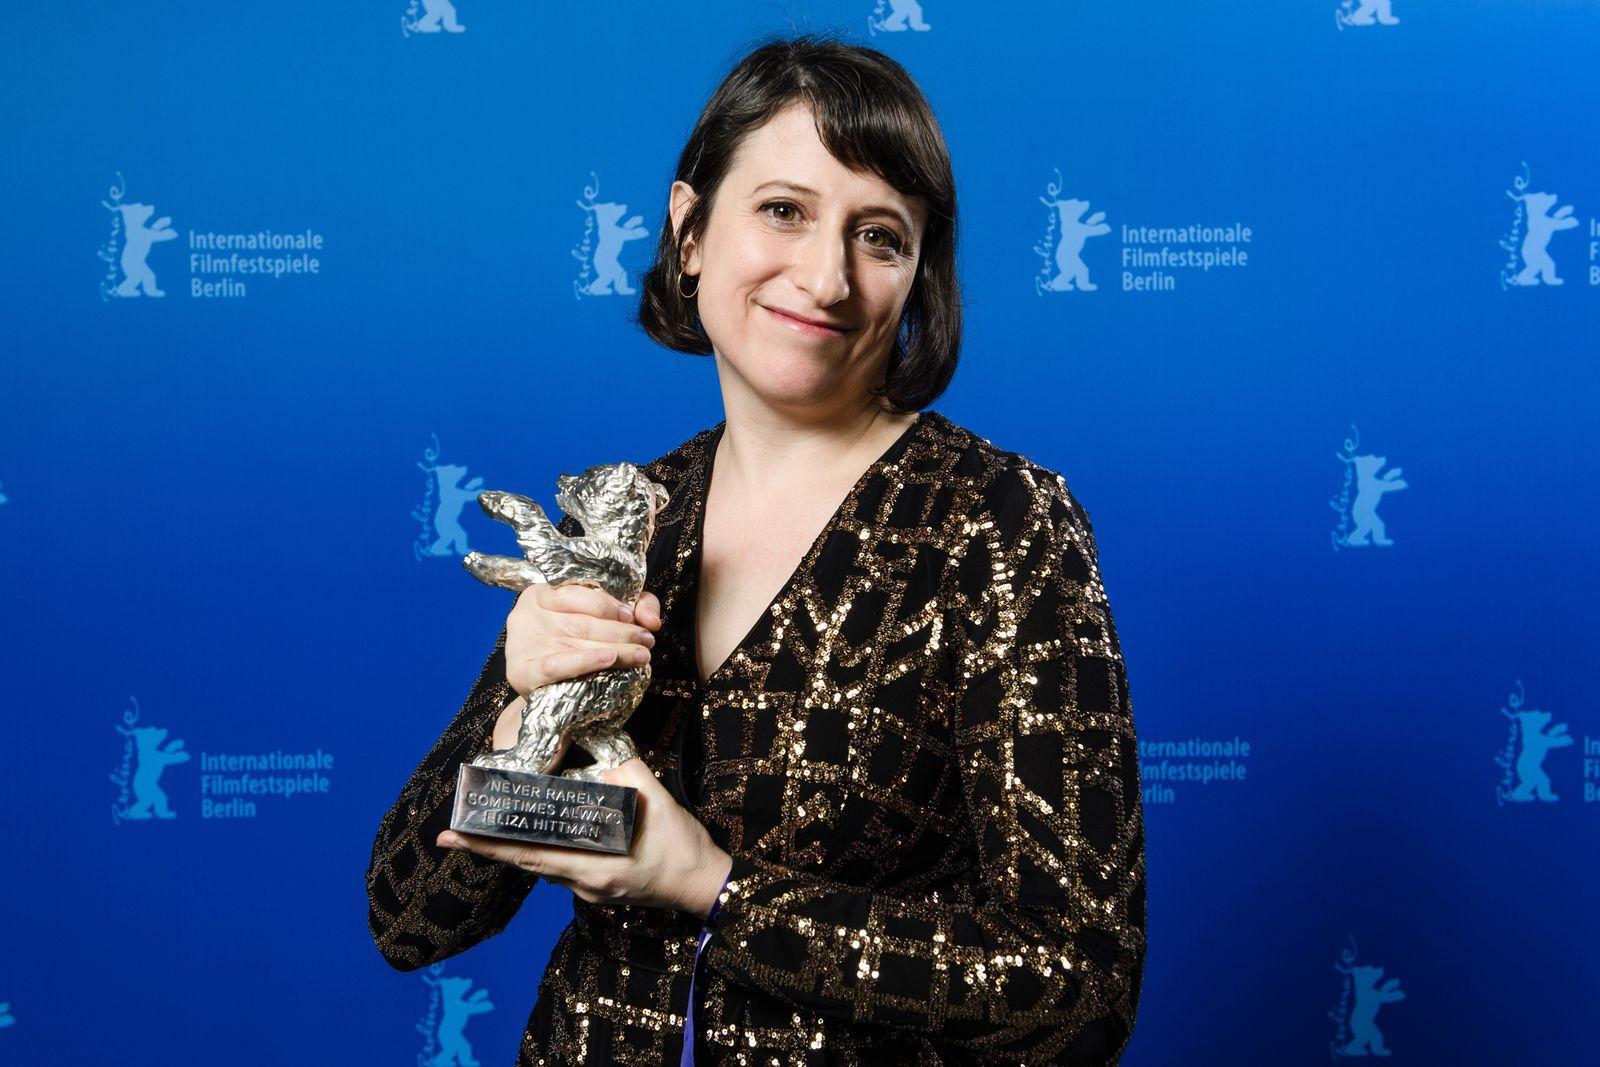 Award Winners Photo Call - 70th Berlinale International Film Festival